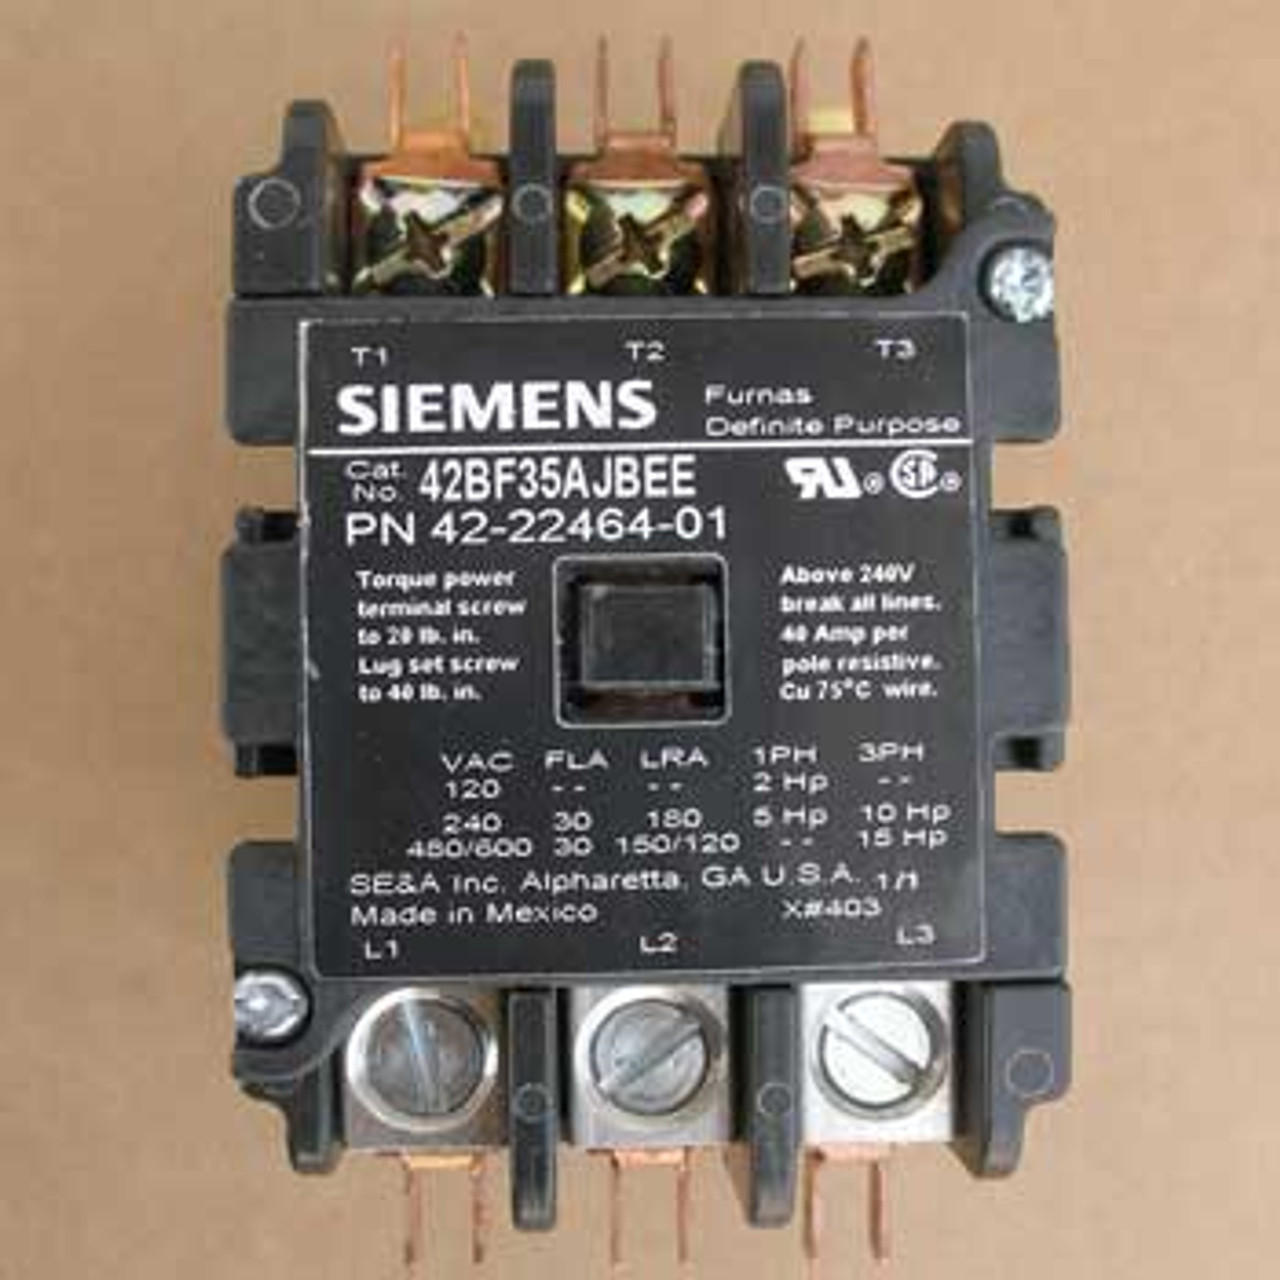 Siemens 42BF35AJBEE Definite Purpose Controller 3P 24VAC 60Hz Coil - New